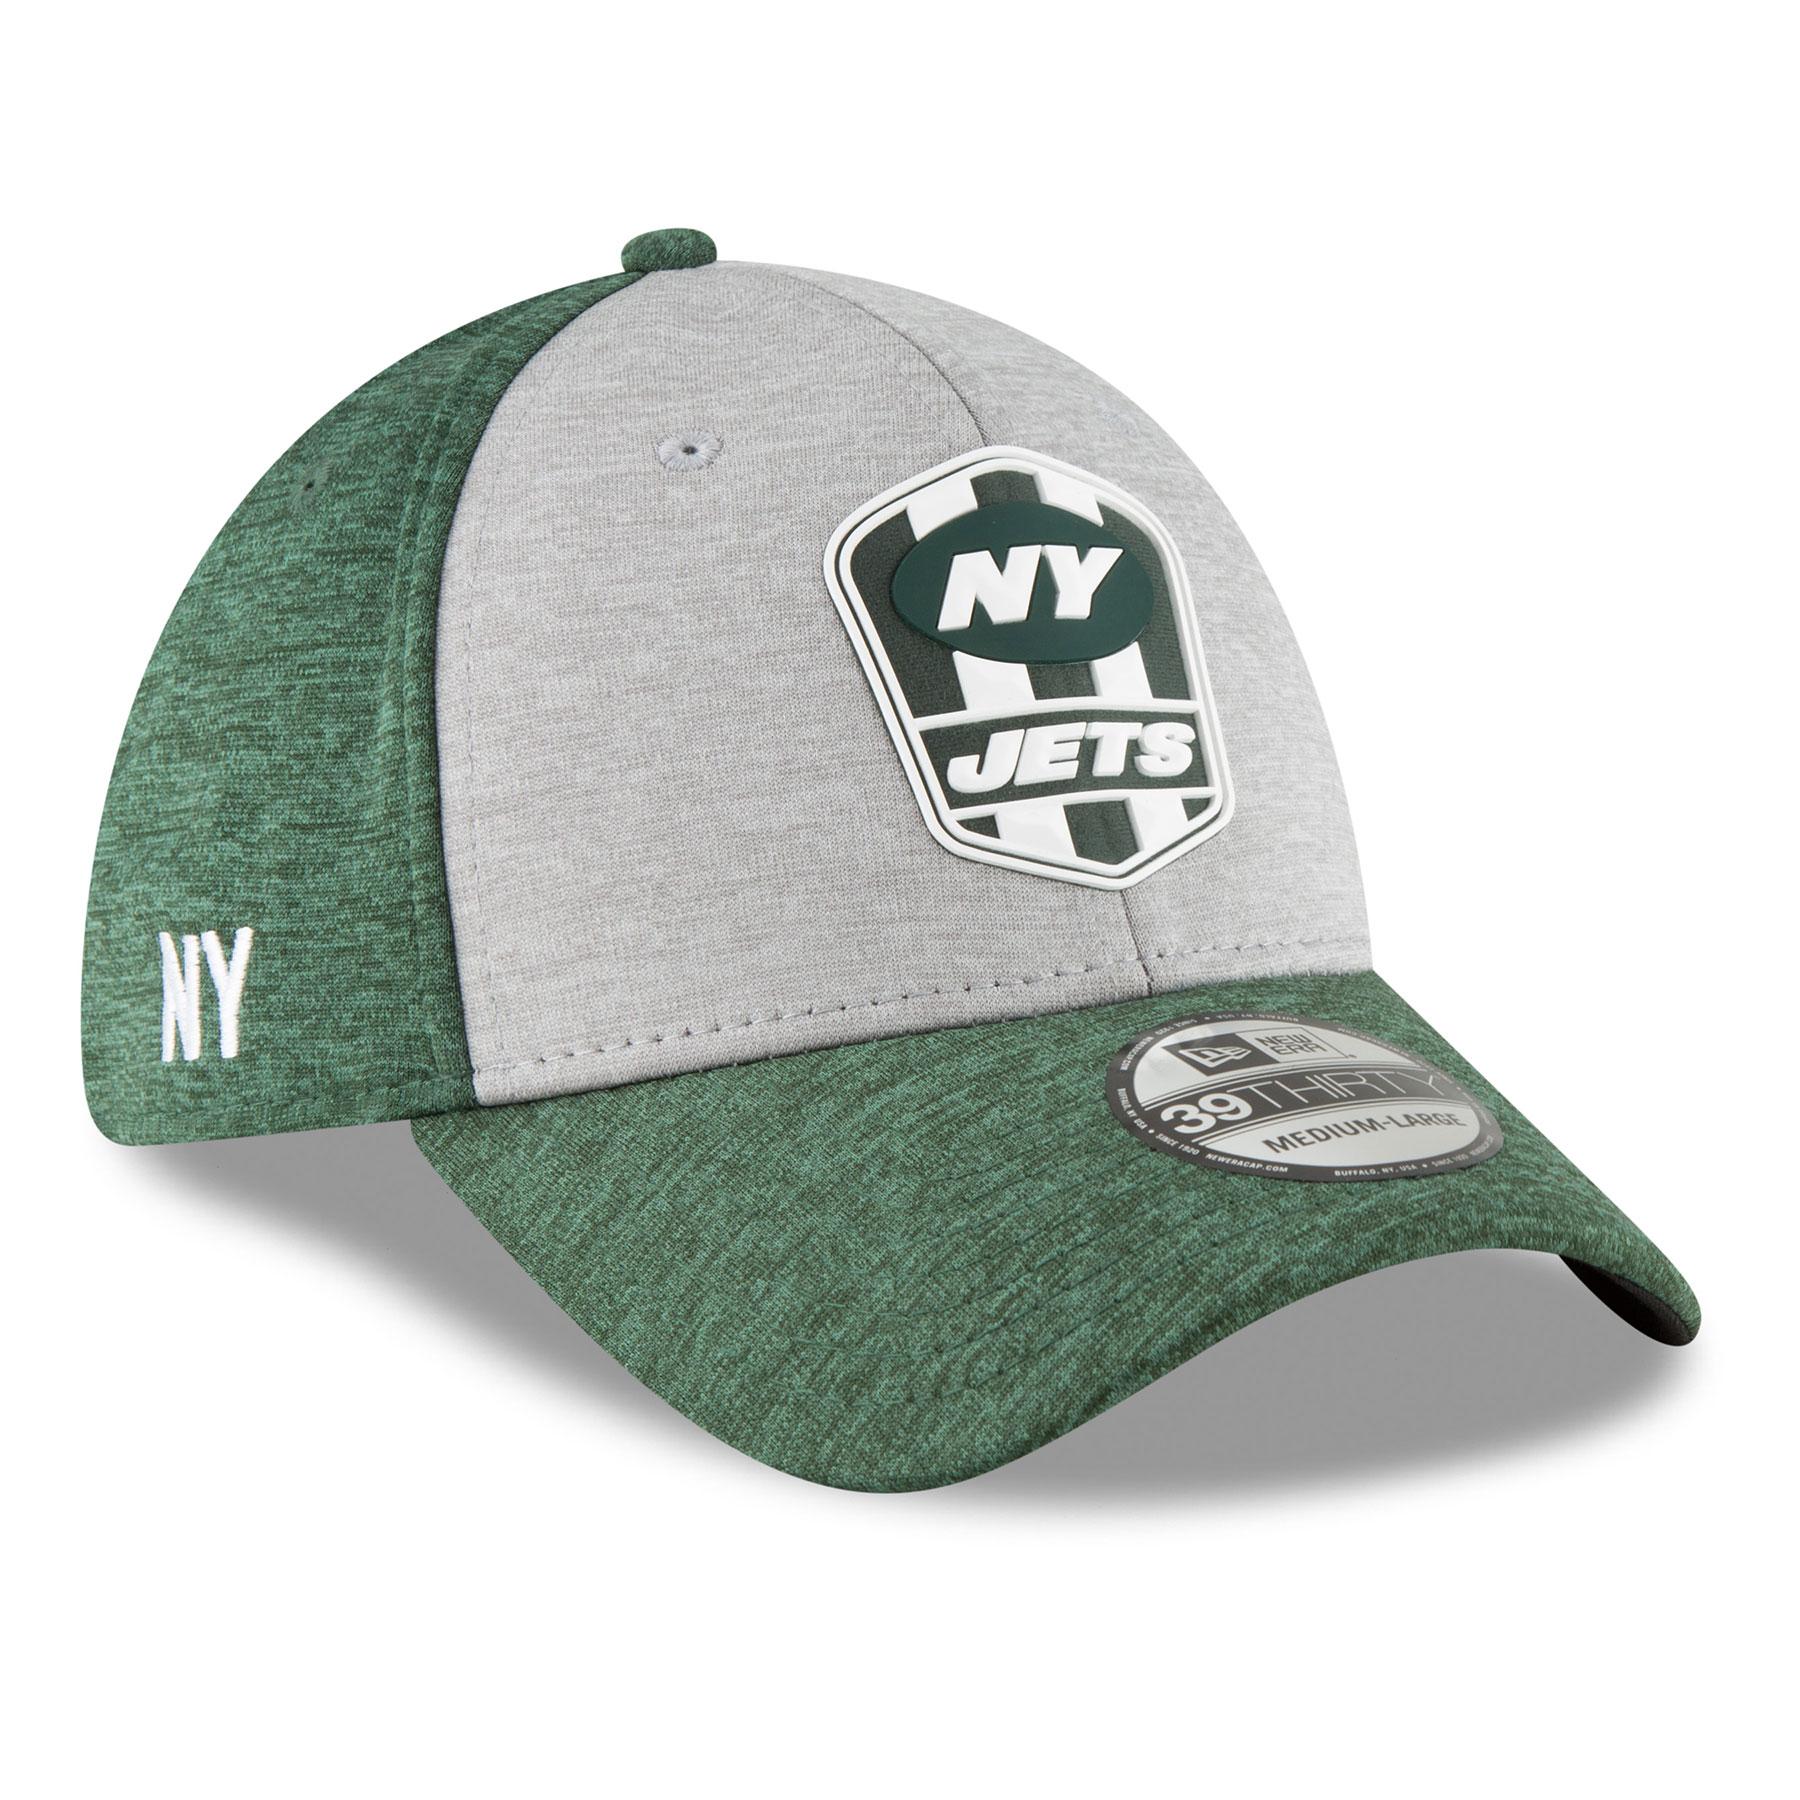 phple2twV New York Jets New Era 2018 NFL On Field Road 39THIRTY Cap - Polyester - Size Medium/L - IceJerseys Hats & Caps NFL Teamware / Logo